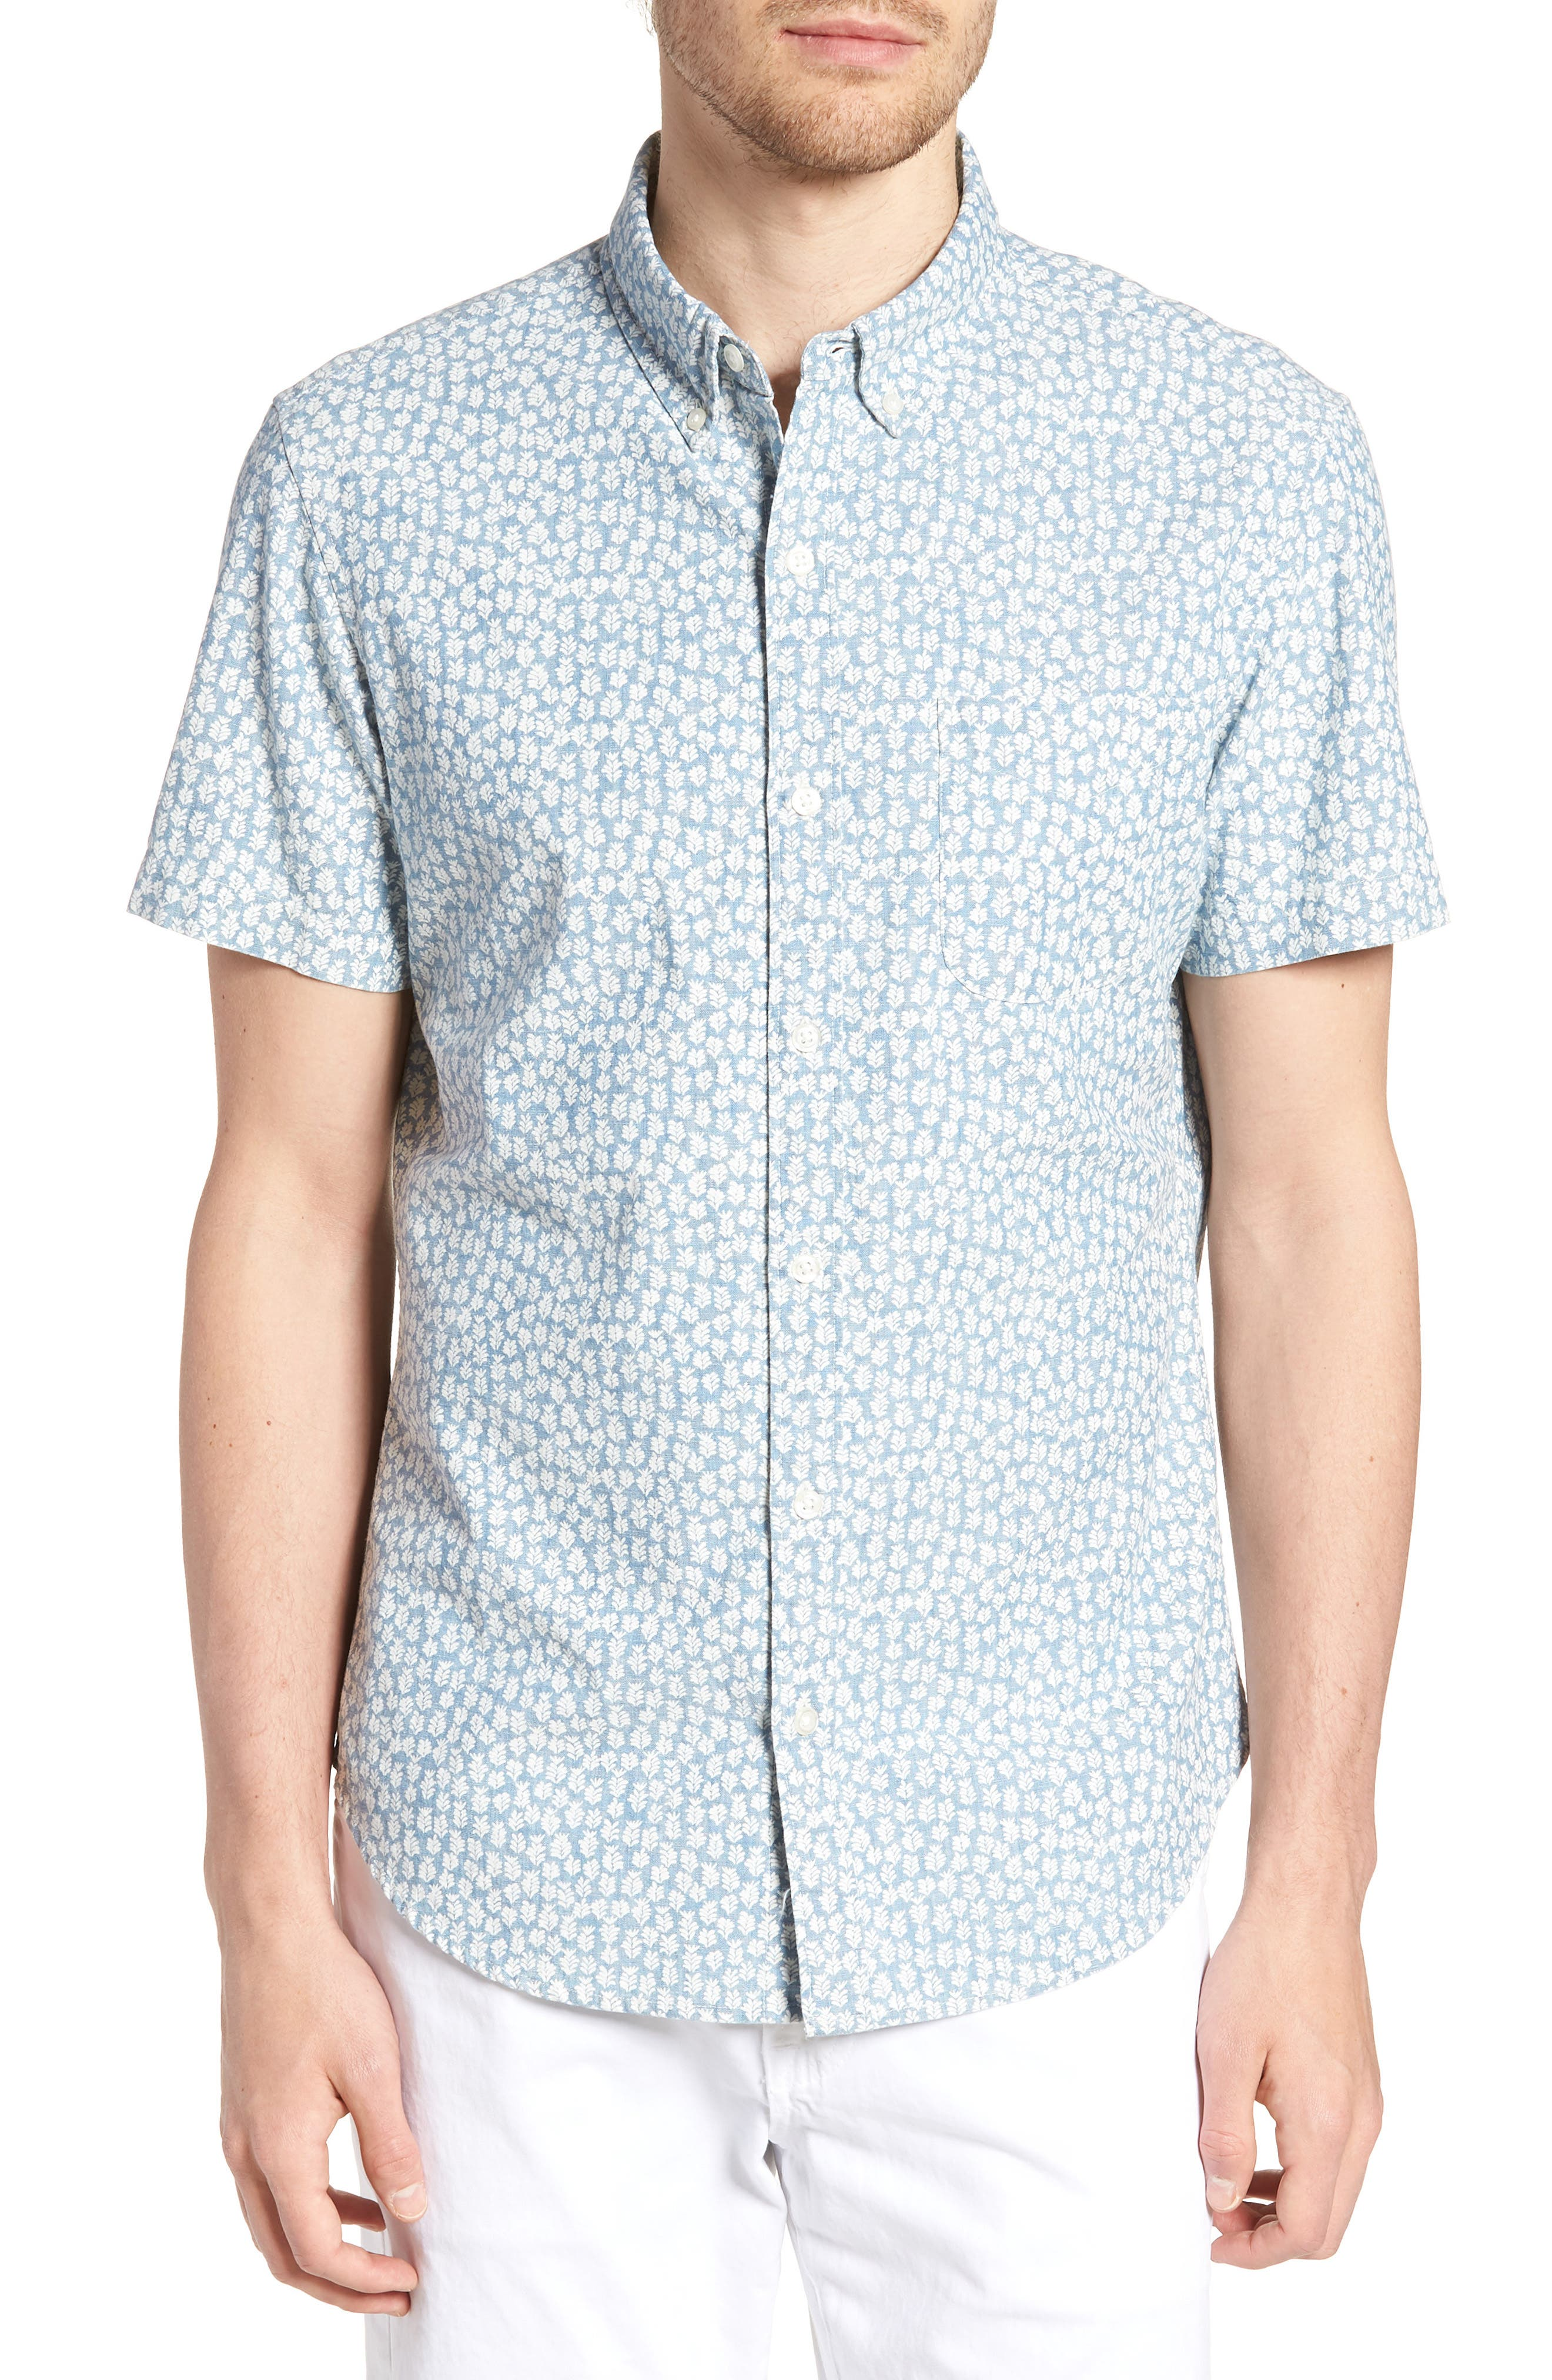 BONOBOS Riviera Slim Fit Leaf Print Sport Shirt, Main, color, 400